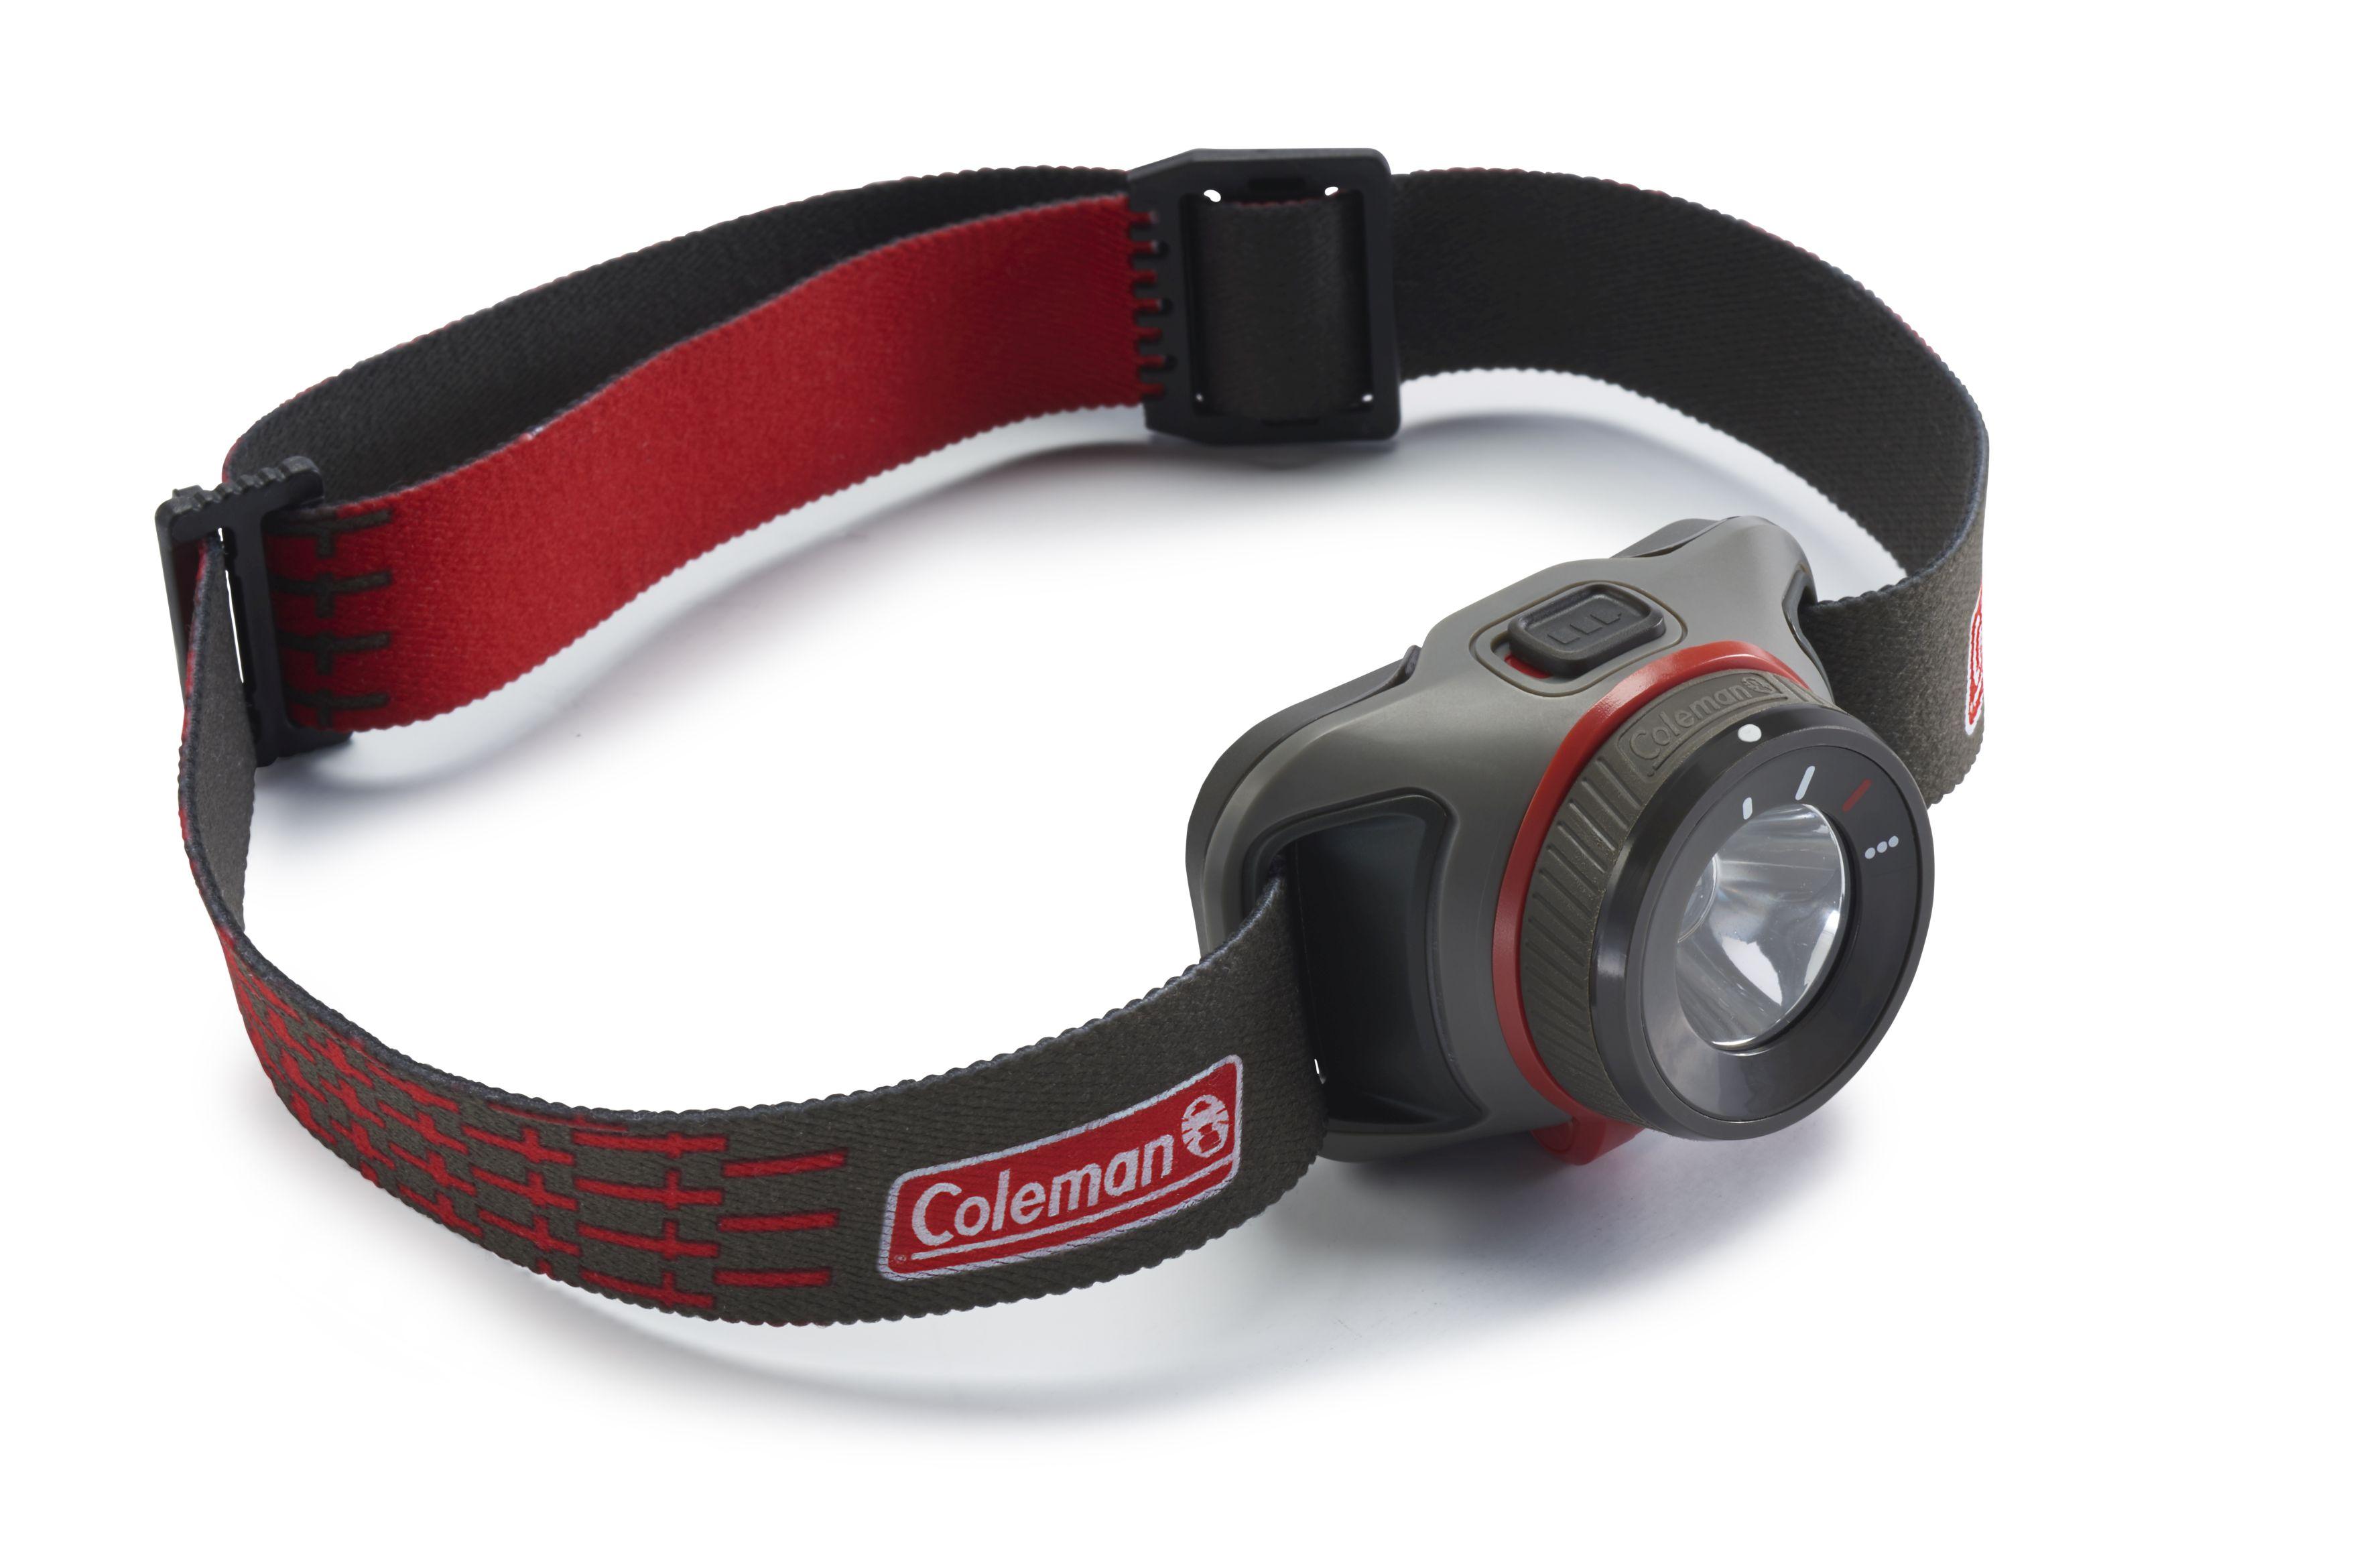 Coleman Batteryguard 300l Headlamp